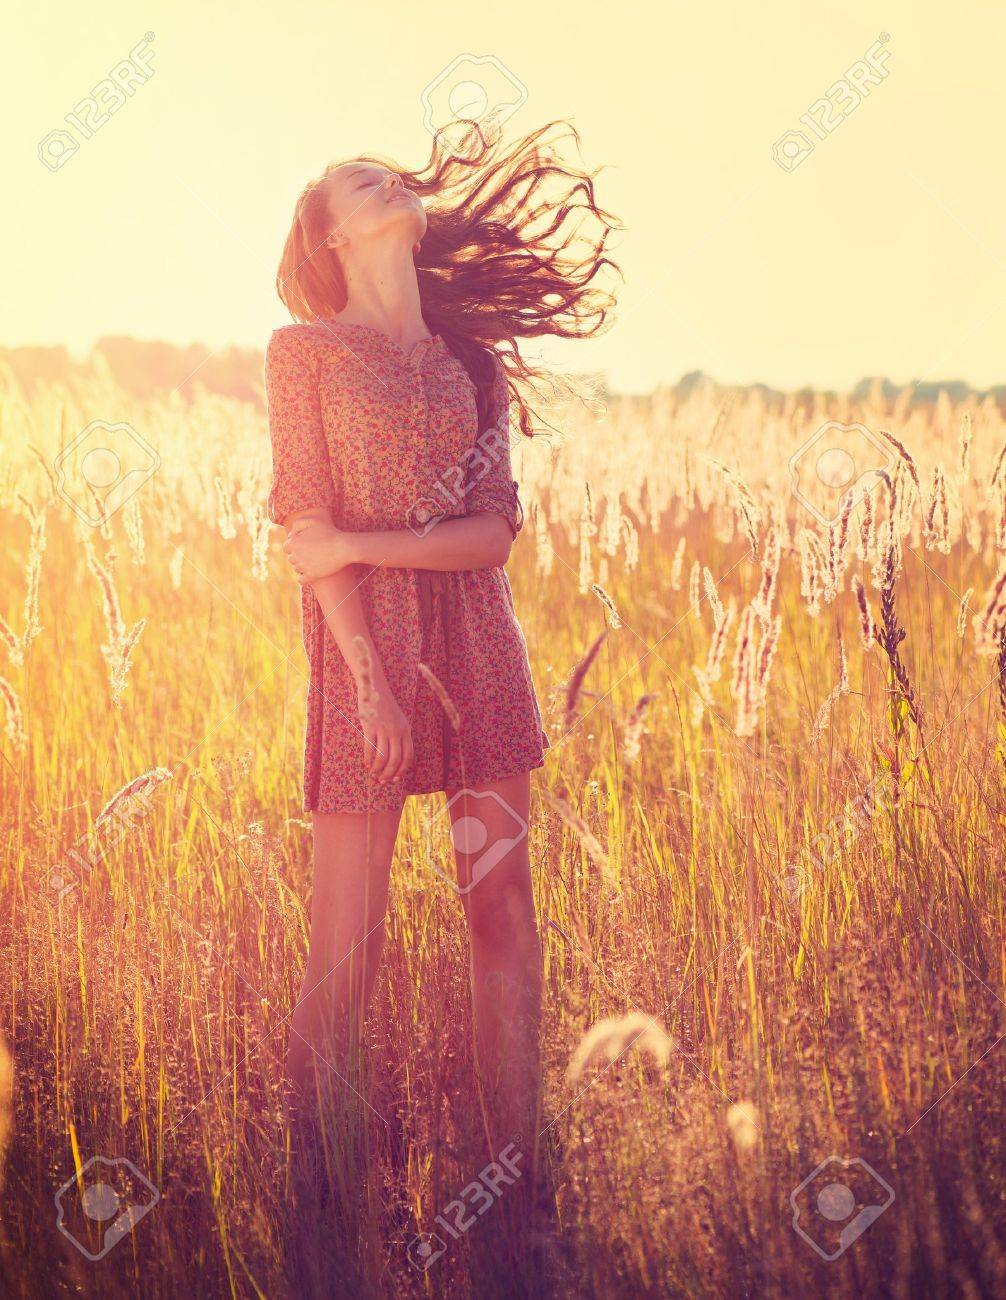 Beauty Romantic Girl Outdoors - 21564630